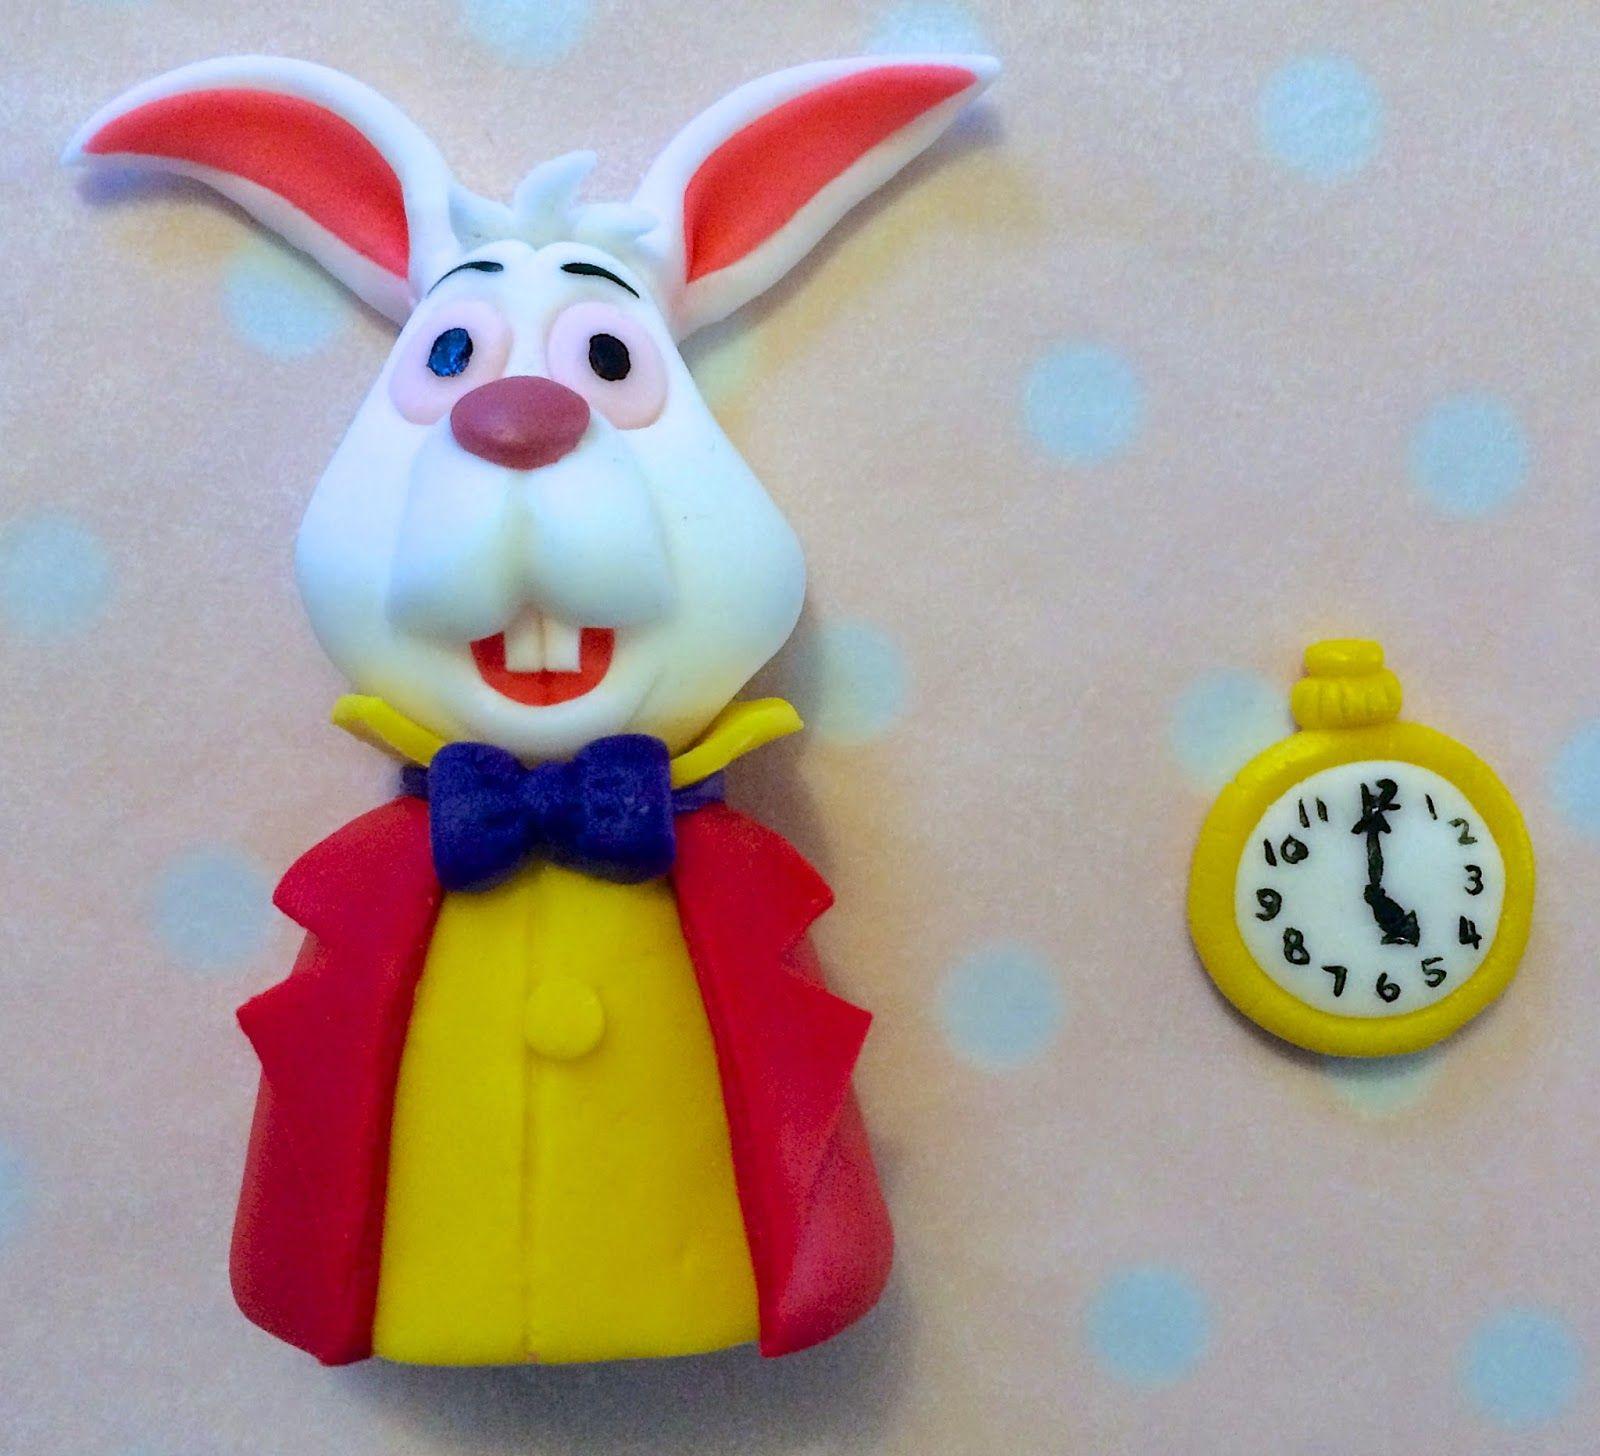 Elaine's Sweet Life: Wonderland Themed Hot Air Balloon Cake {Photo Tutorial and…